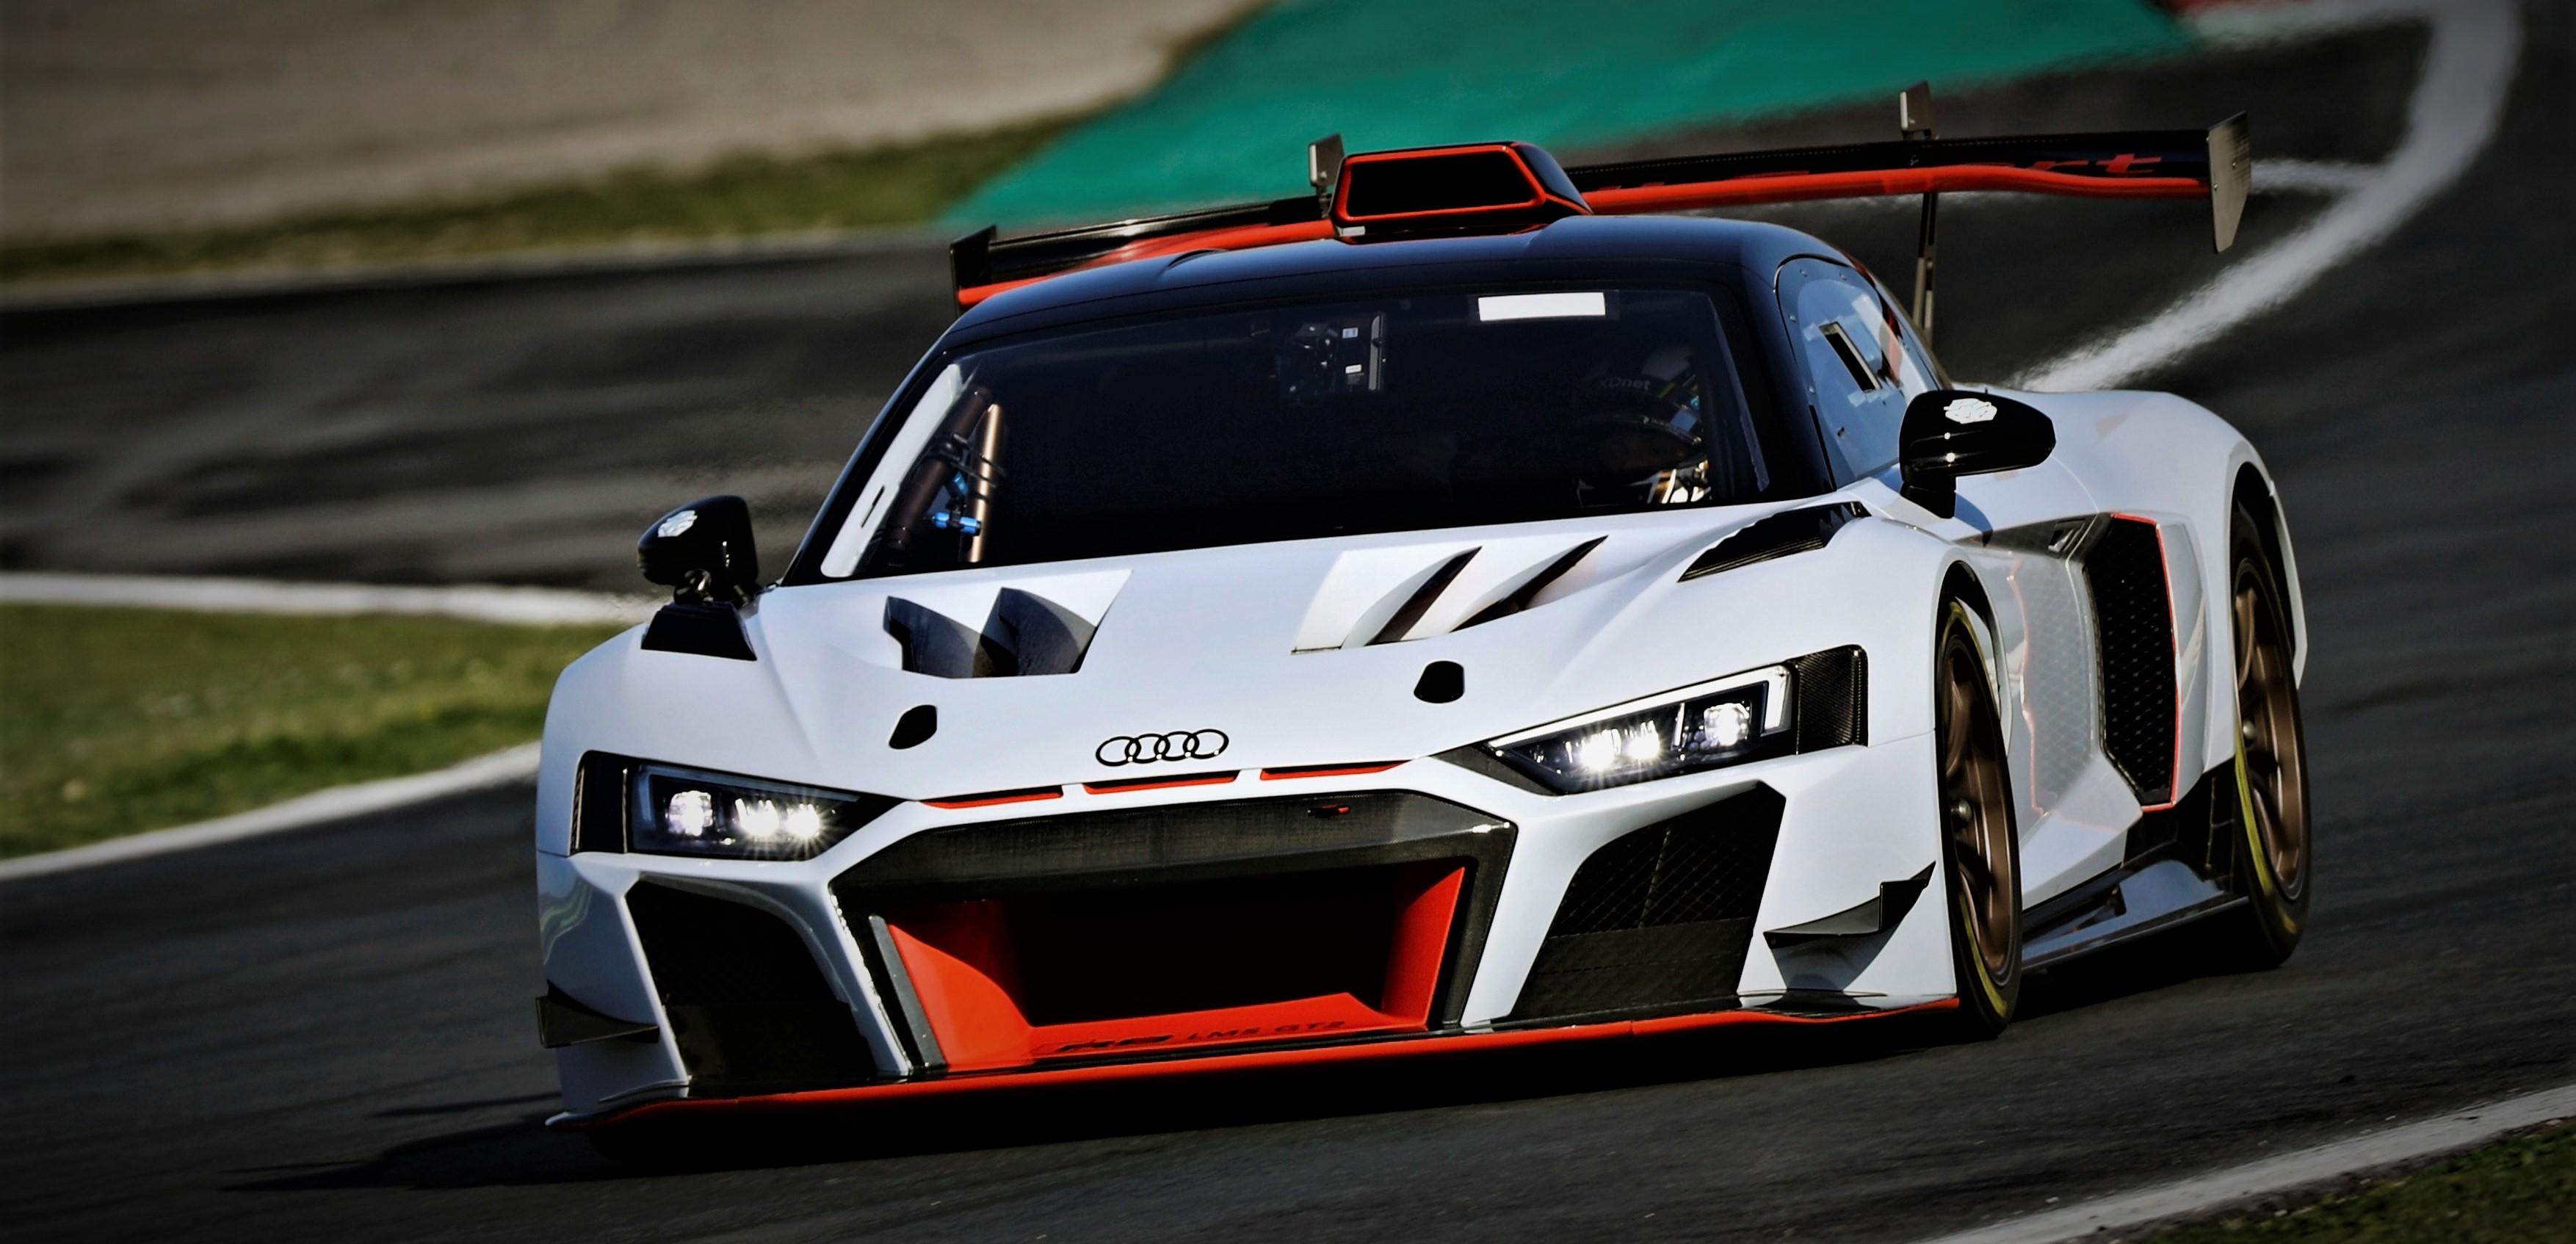 Audi R8 LMS GT2 (PK Carsport)